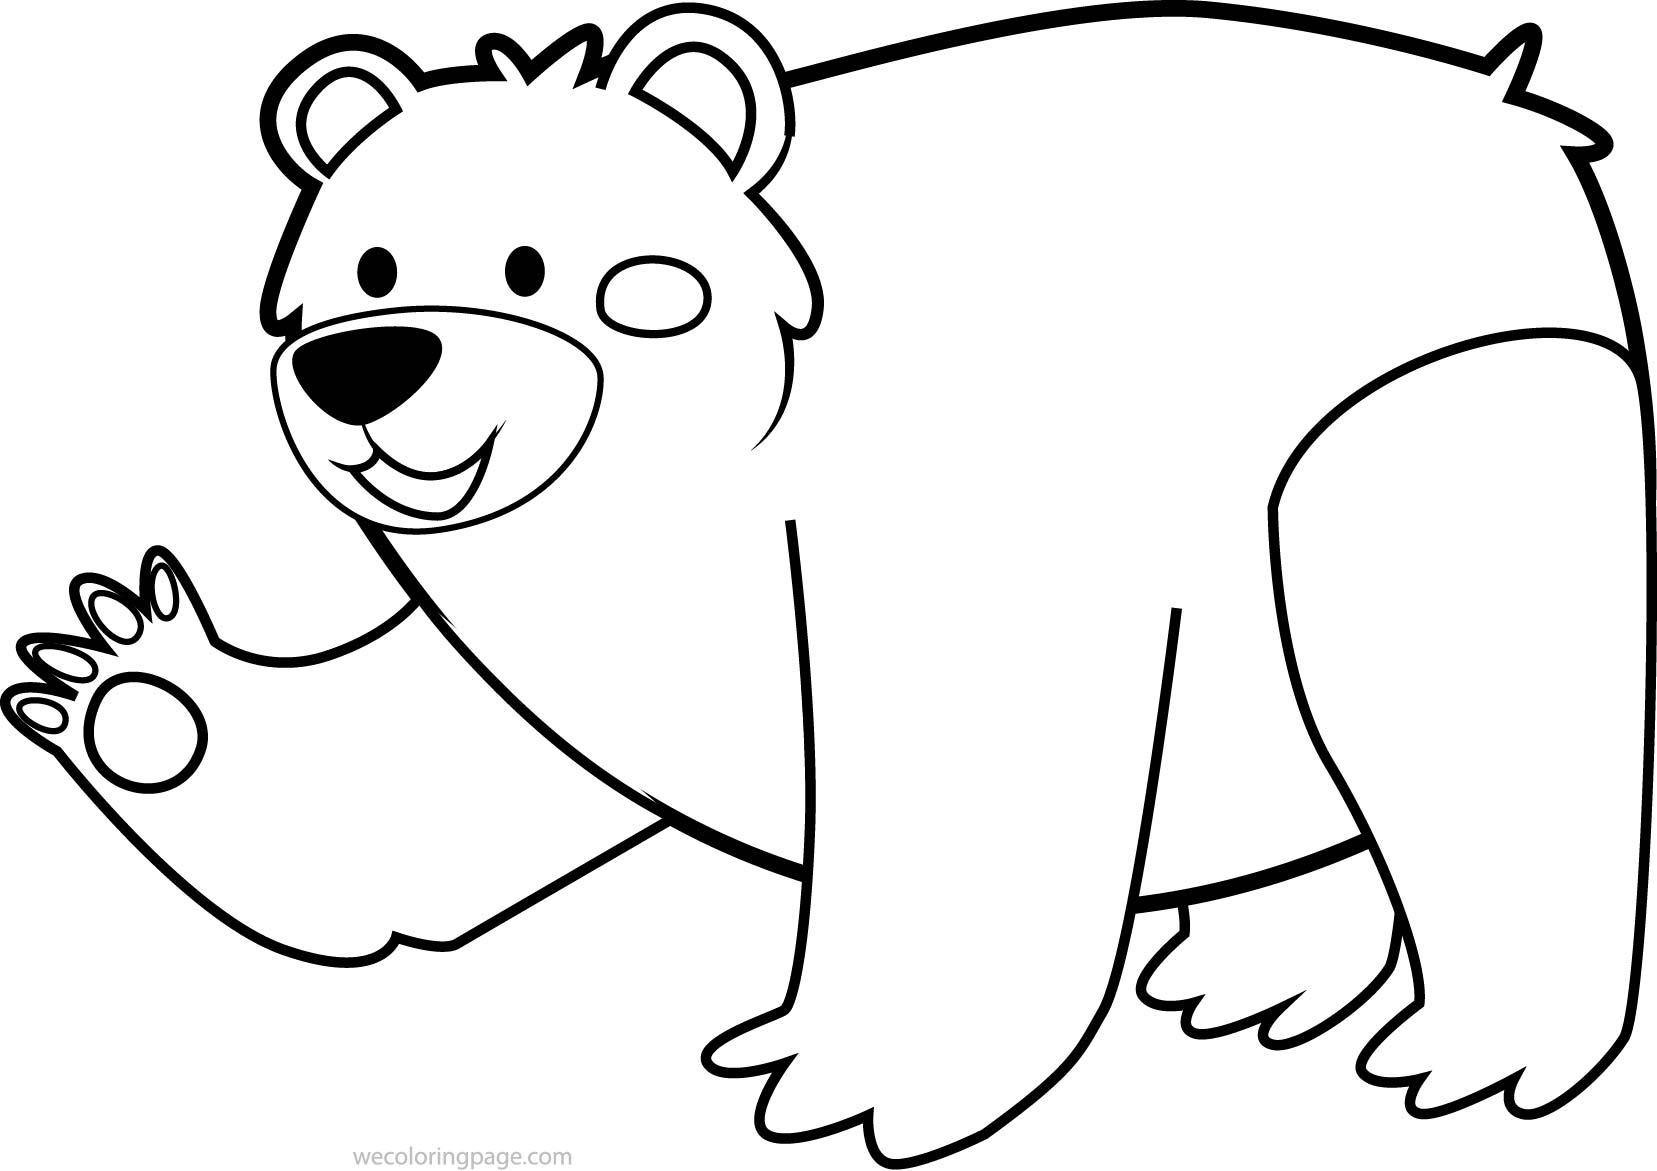 Cute Animal Bear Coloring Page Wecoloringpage